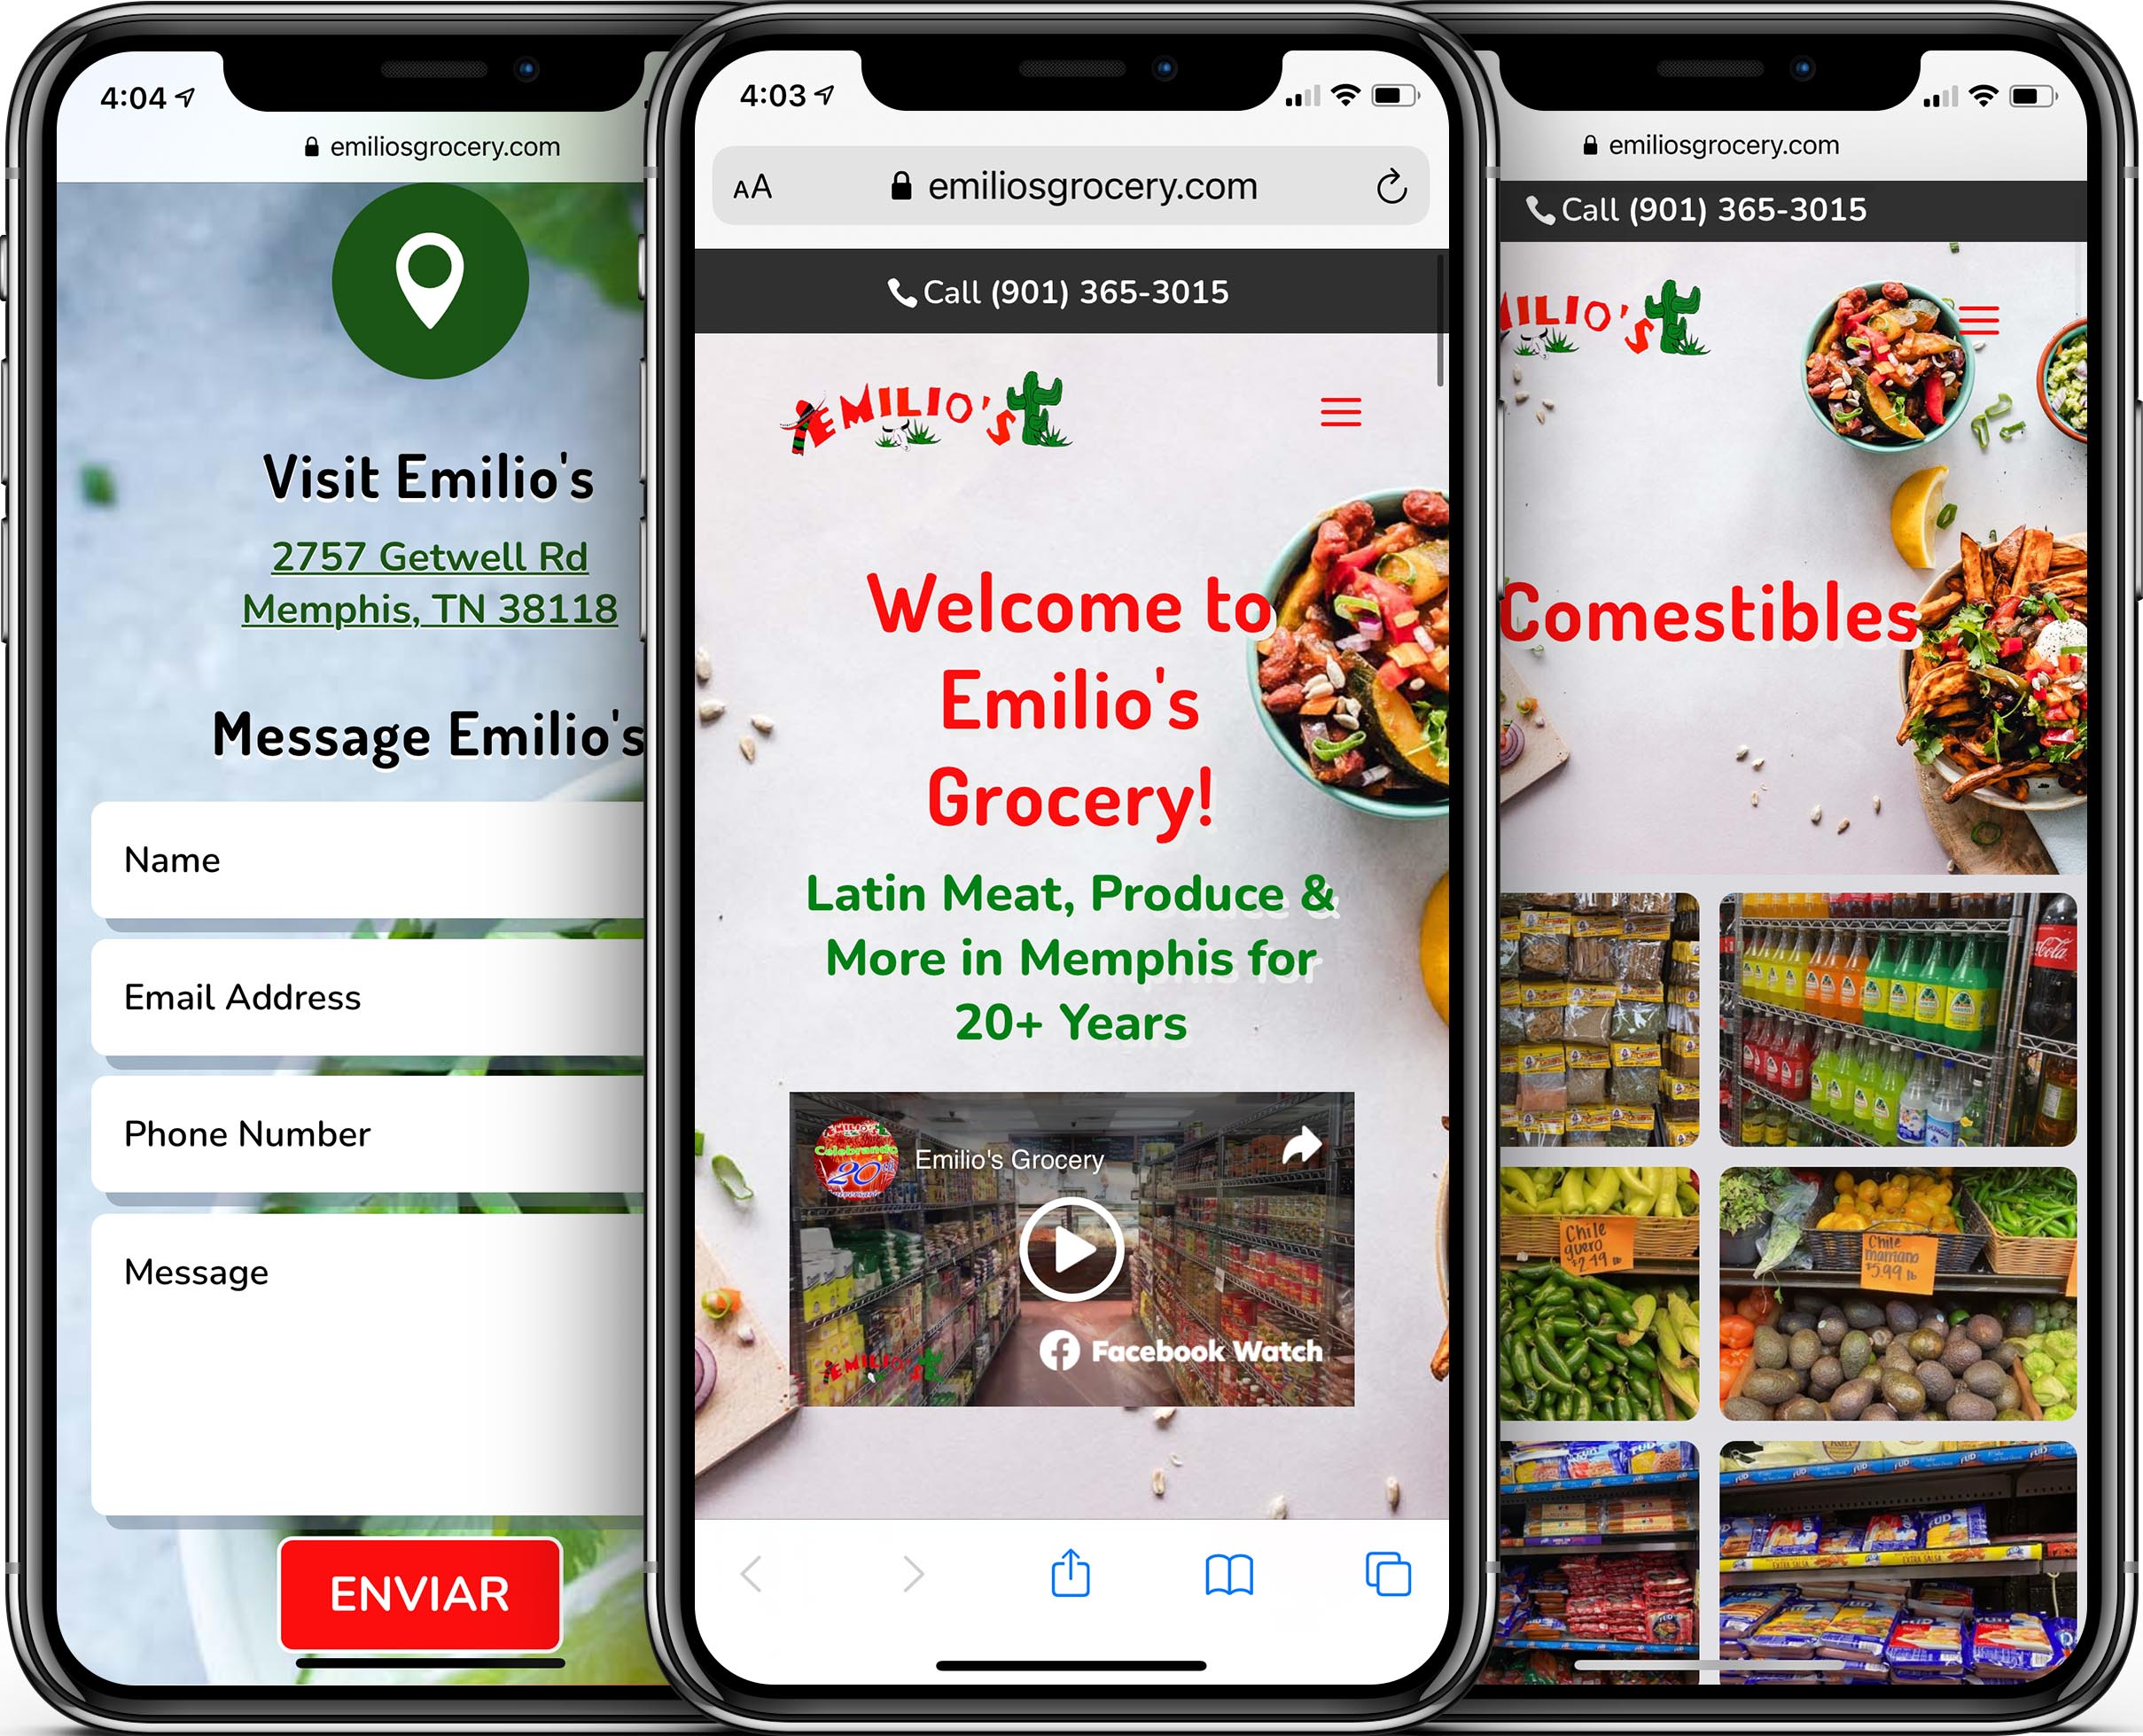 Emilio's Grocery Mobile-Friendly Web Design